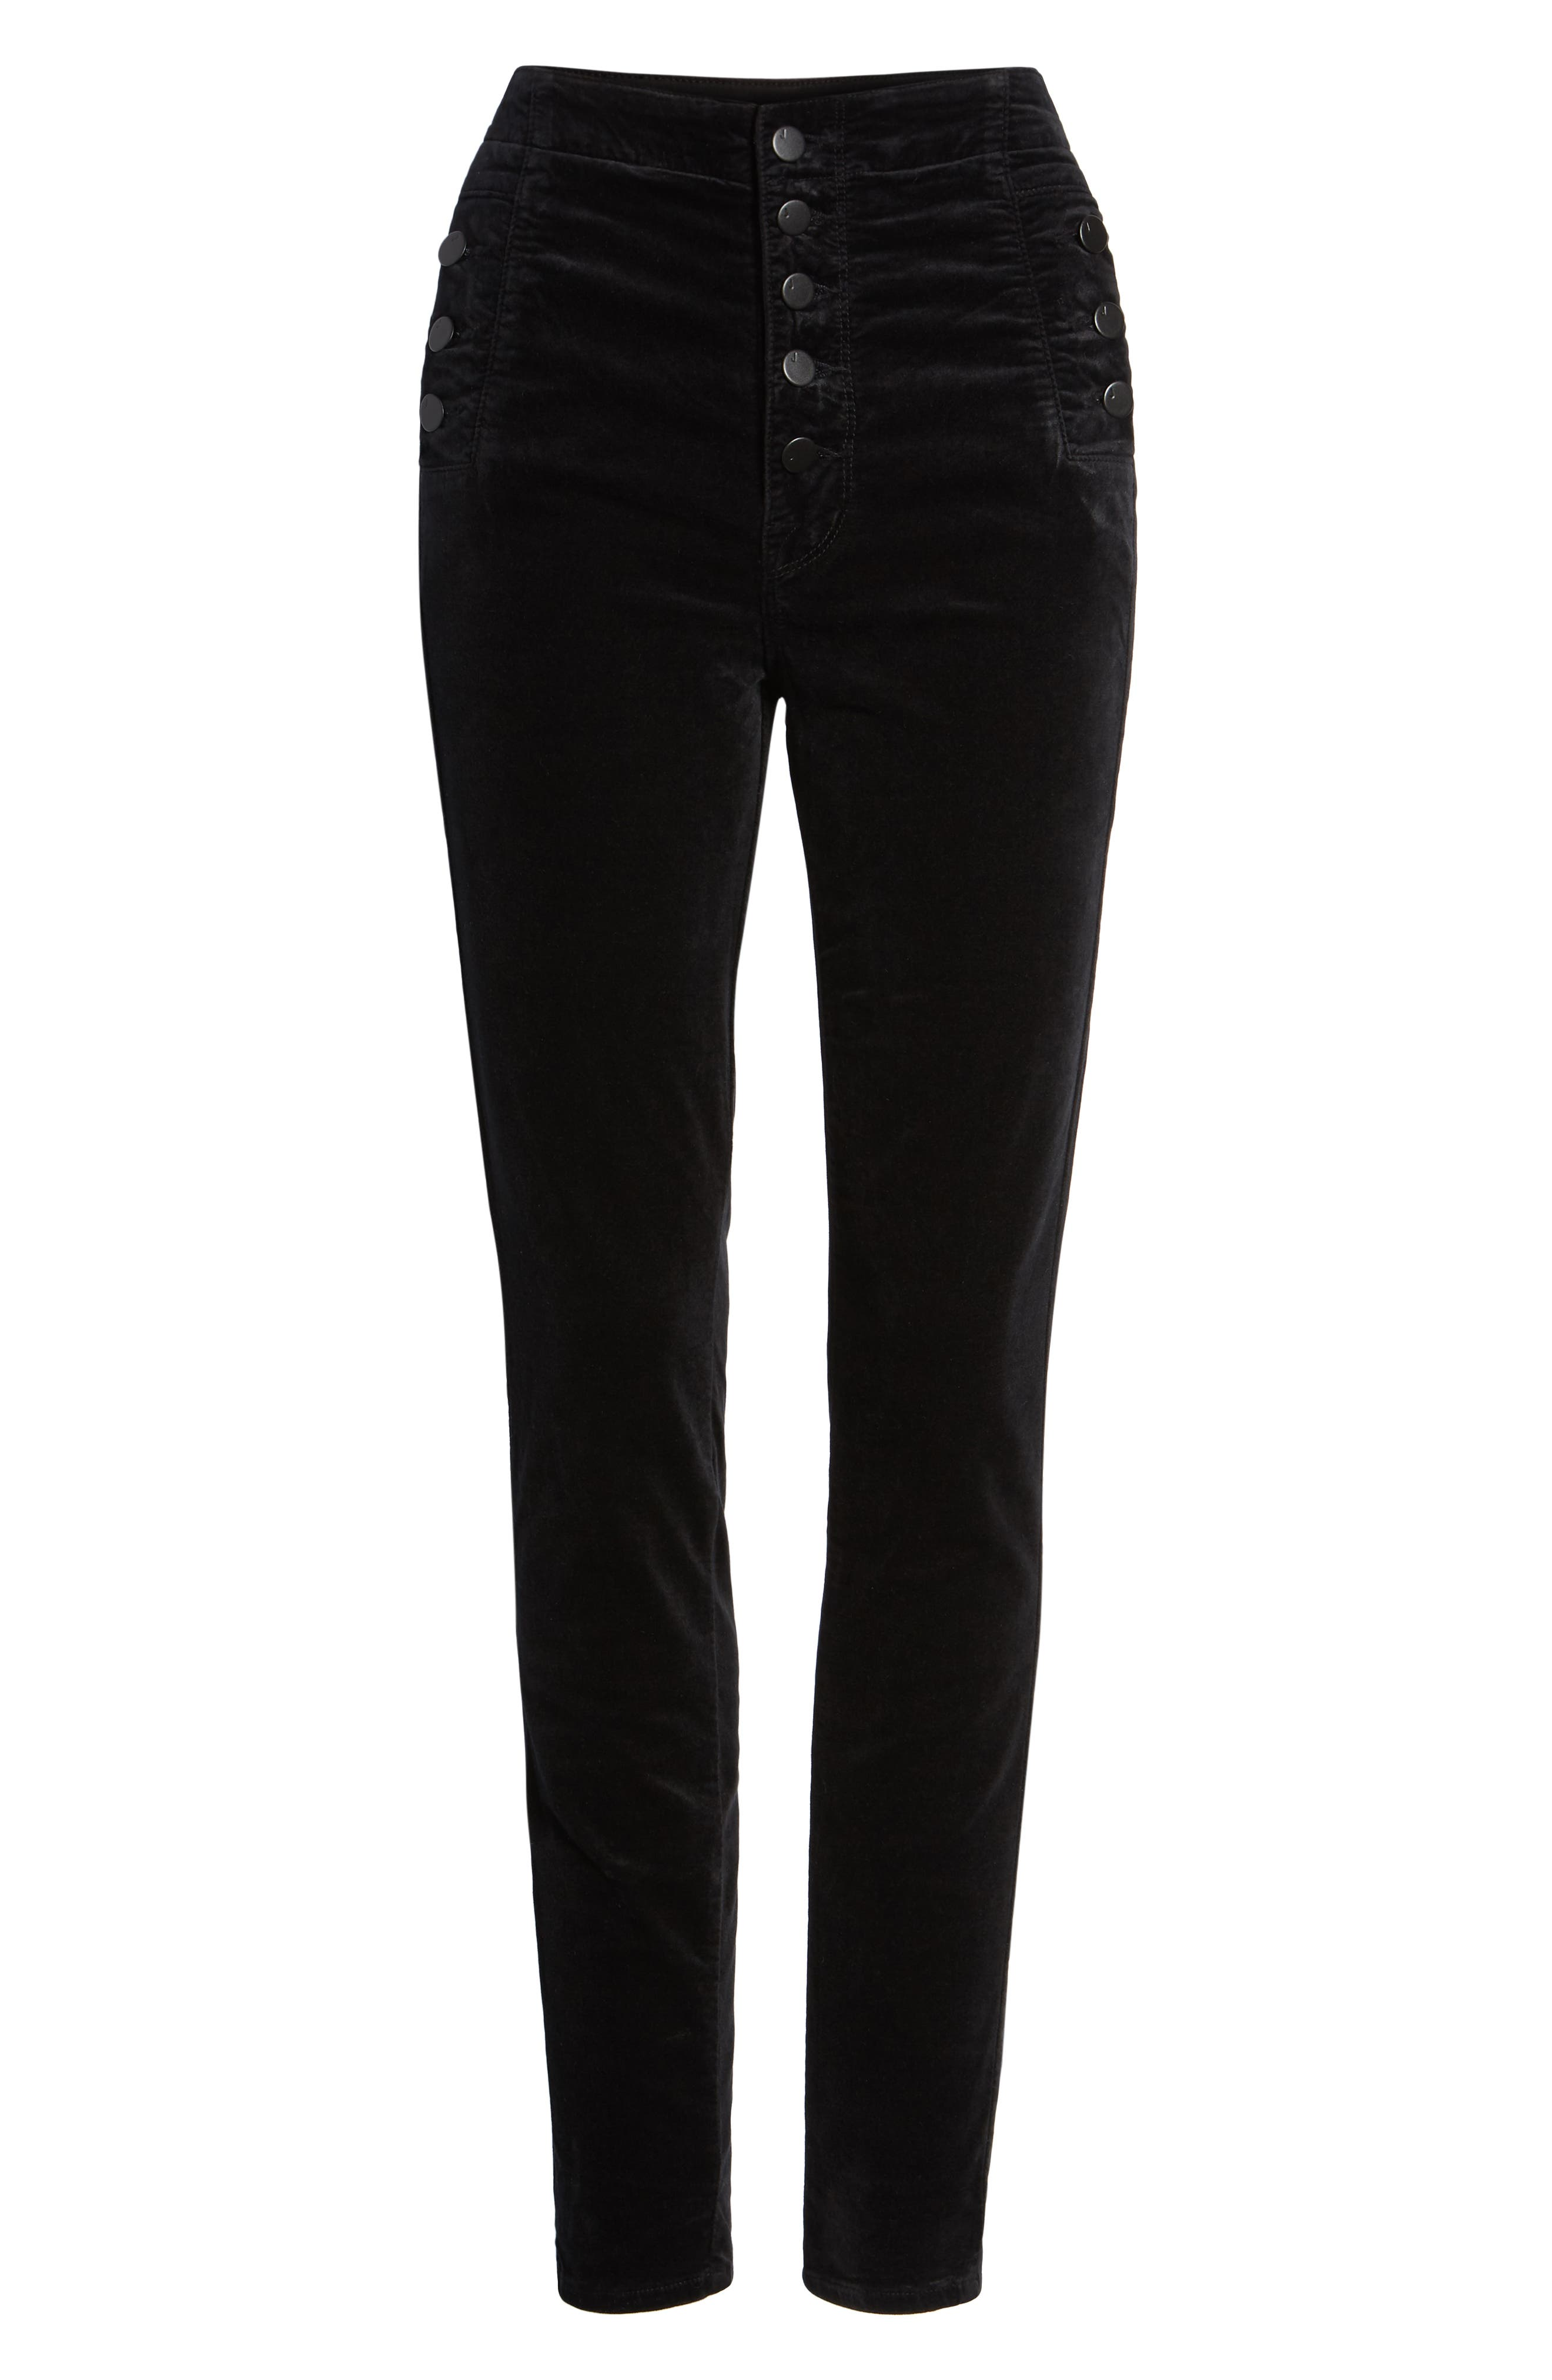 Natasha Sky High Velvet Skinny Pants,                             Alternate thumbnail 4, color,                             BLACK